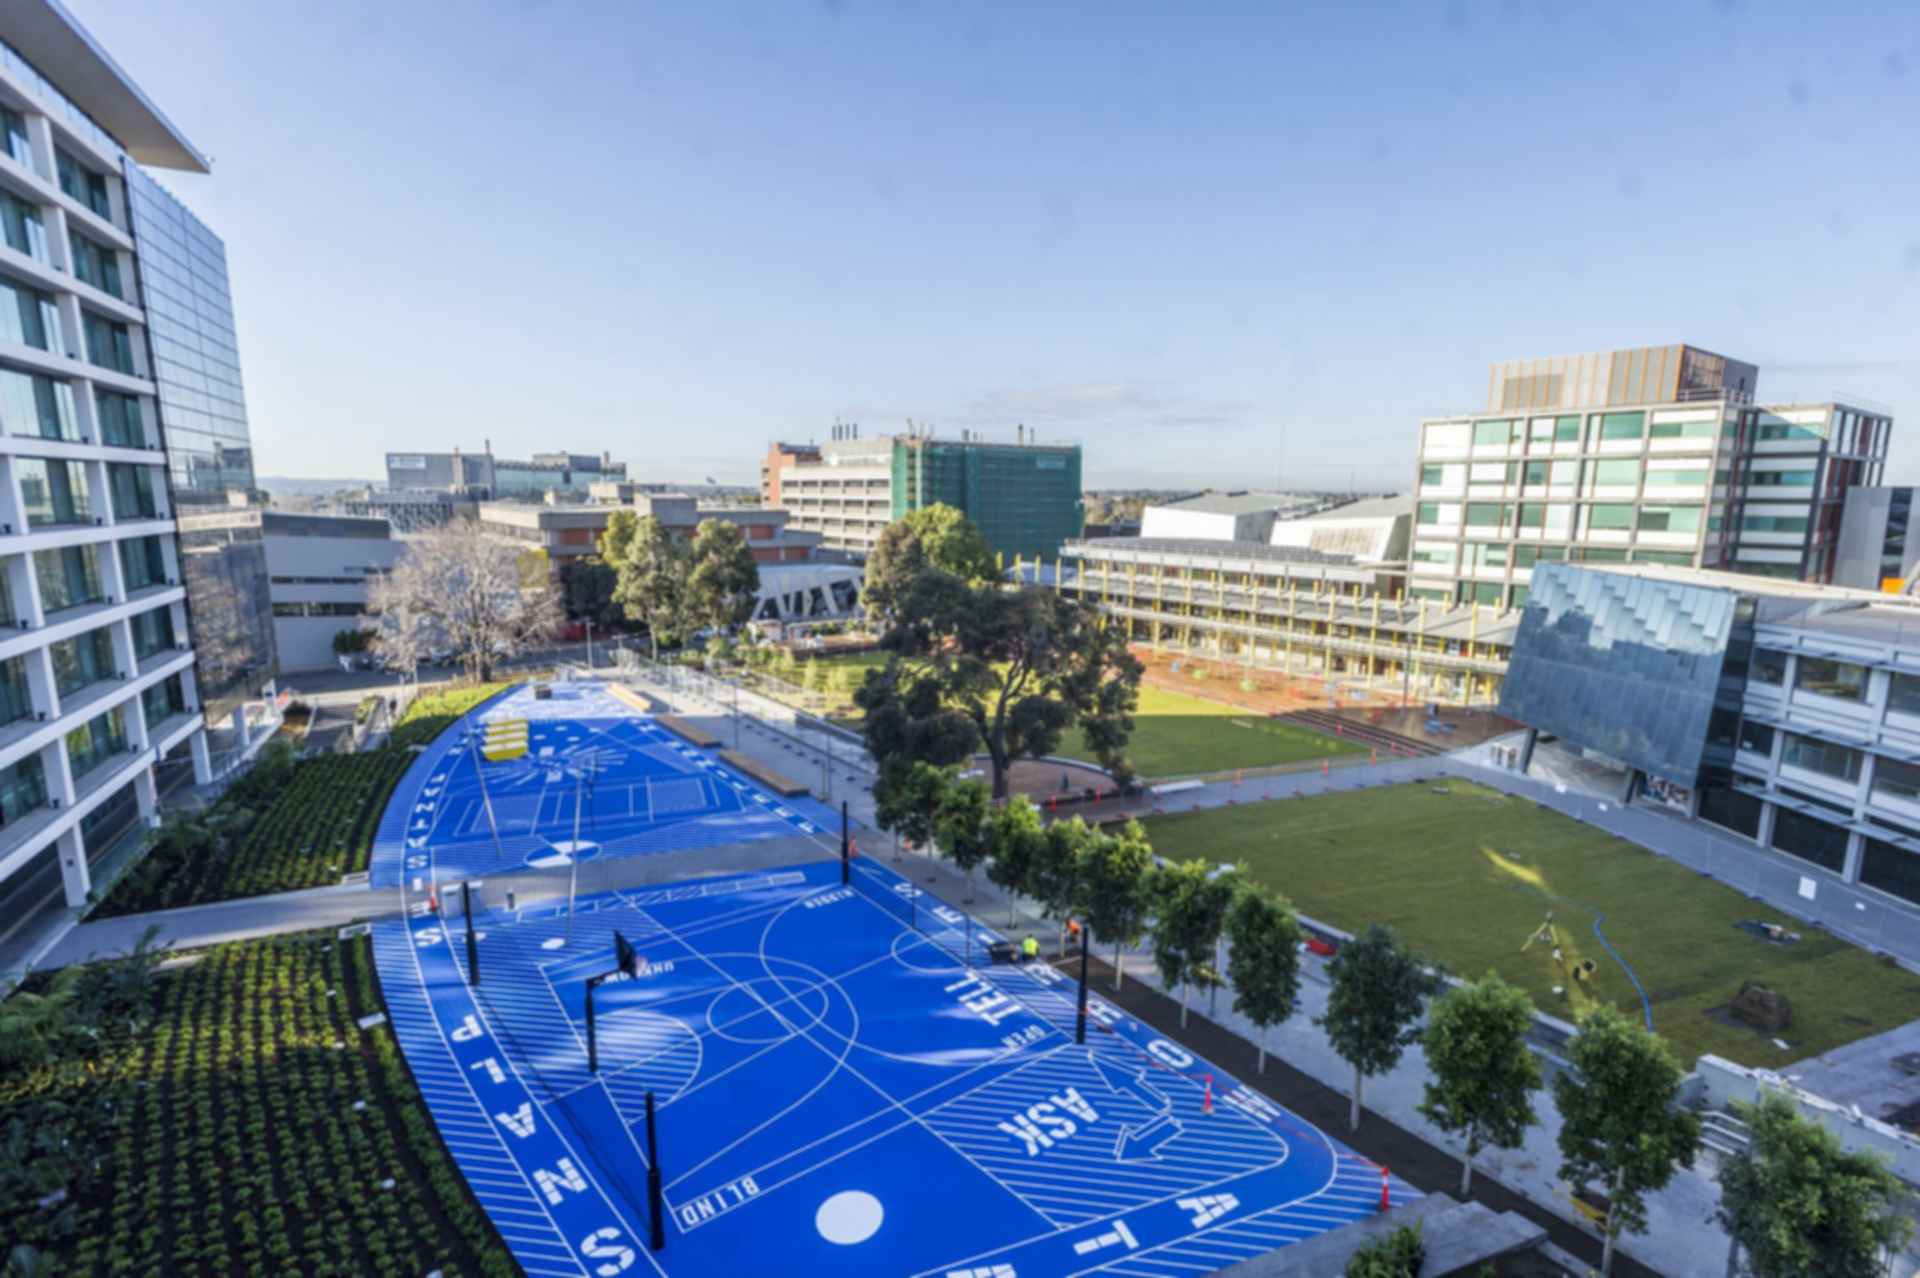 Caulfield Campus Green - exterior